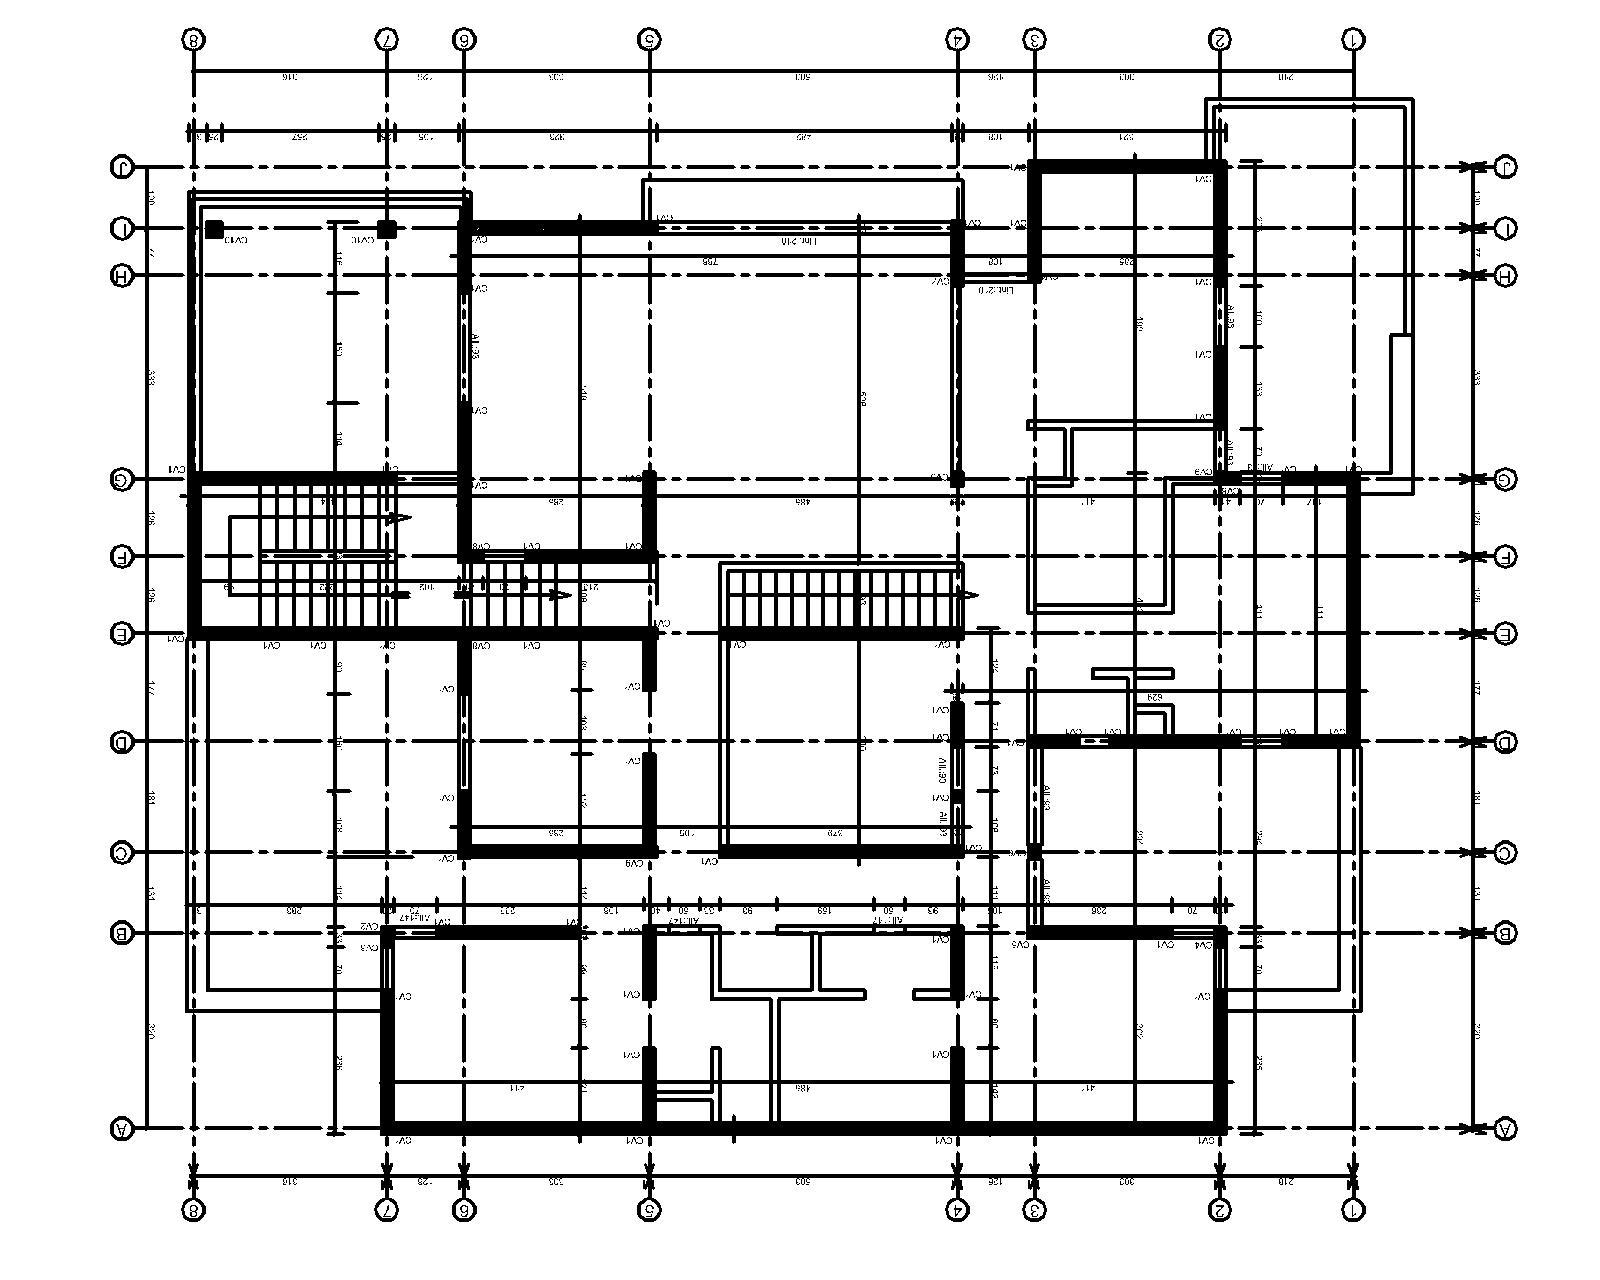 dessin maison plan architecture habitations. Black Bedroom Furniture Sets. Home Design Ideas